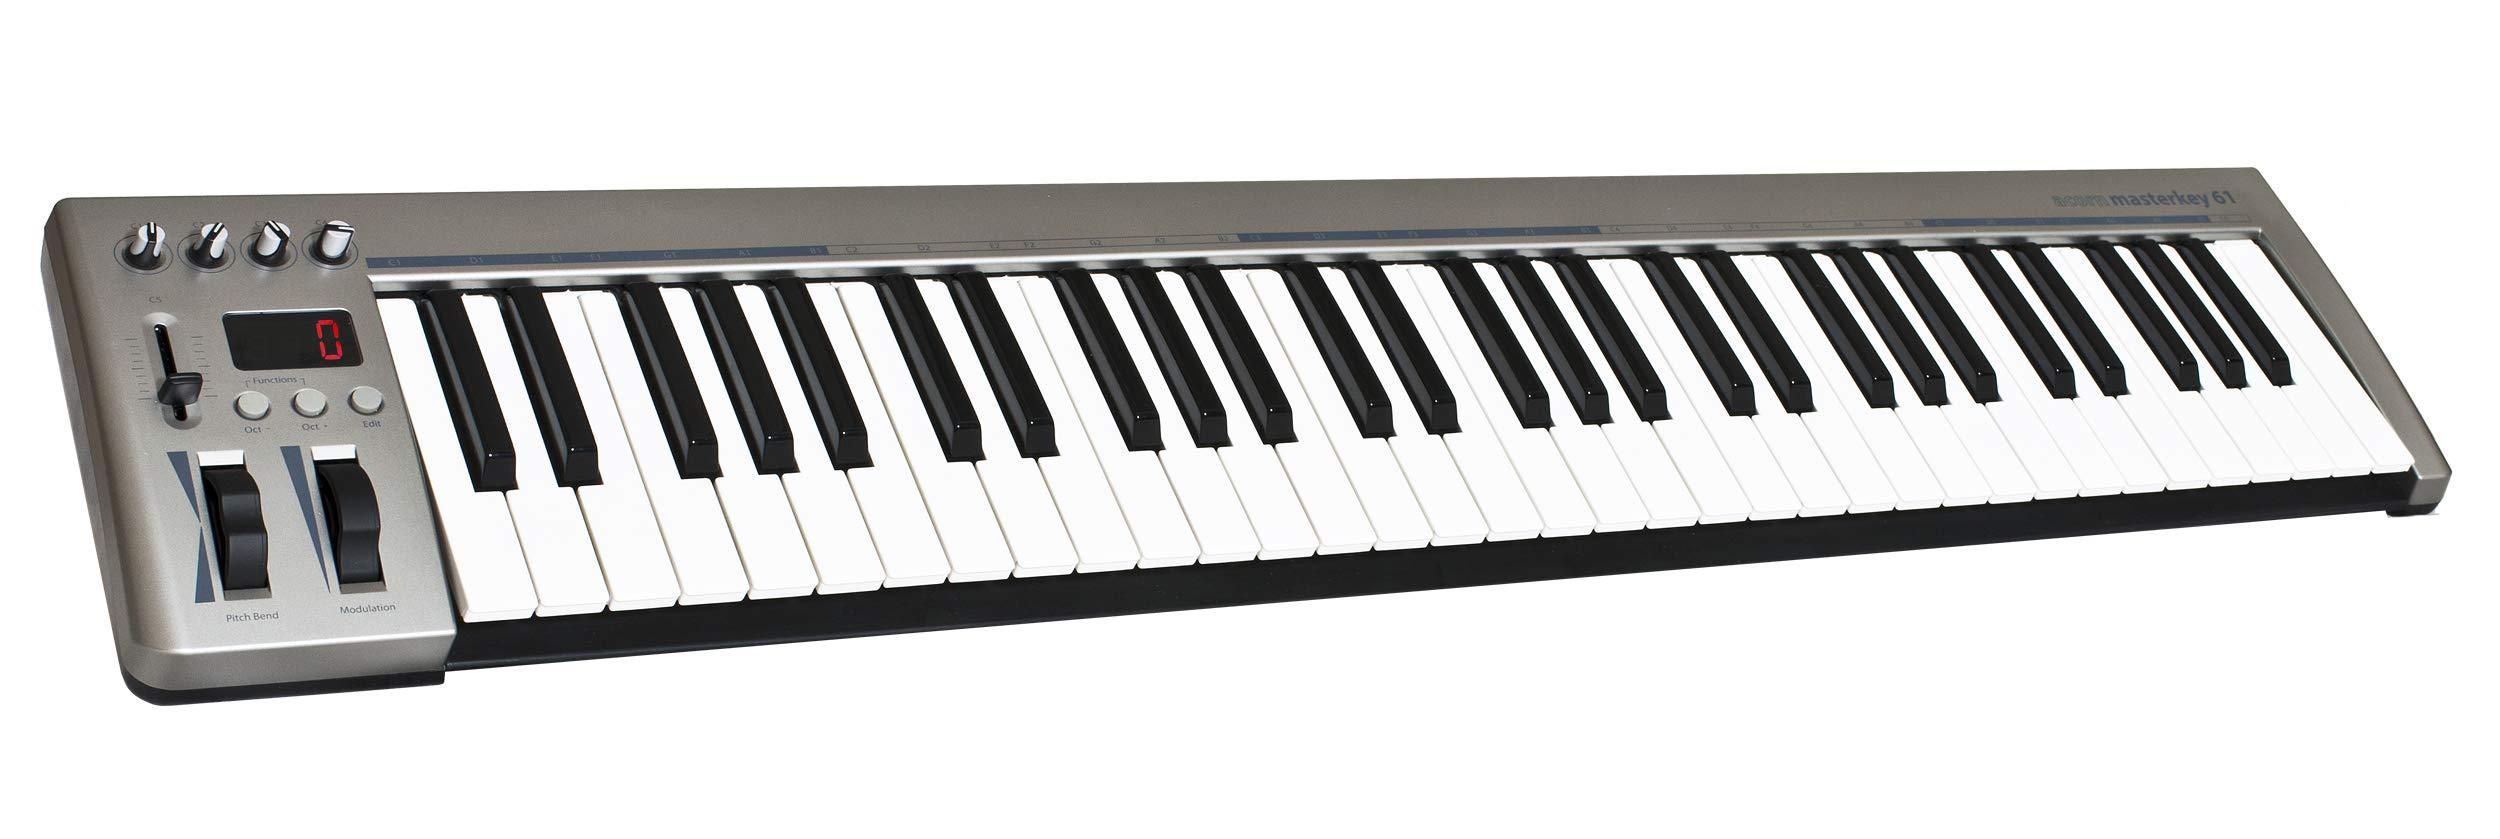 Acorn MIDI Controller Keyboard, 10.24 x 4.33 x 39.96 inches (Masterkey 61) by Acorn